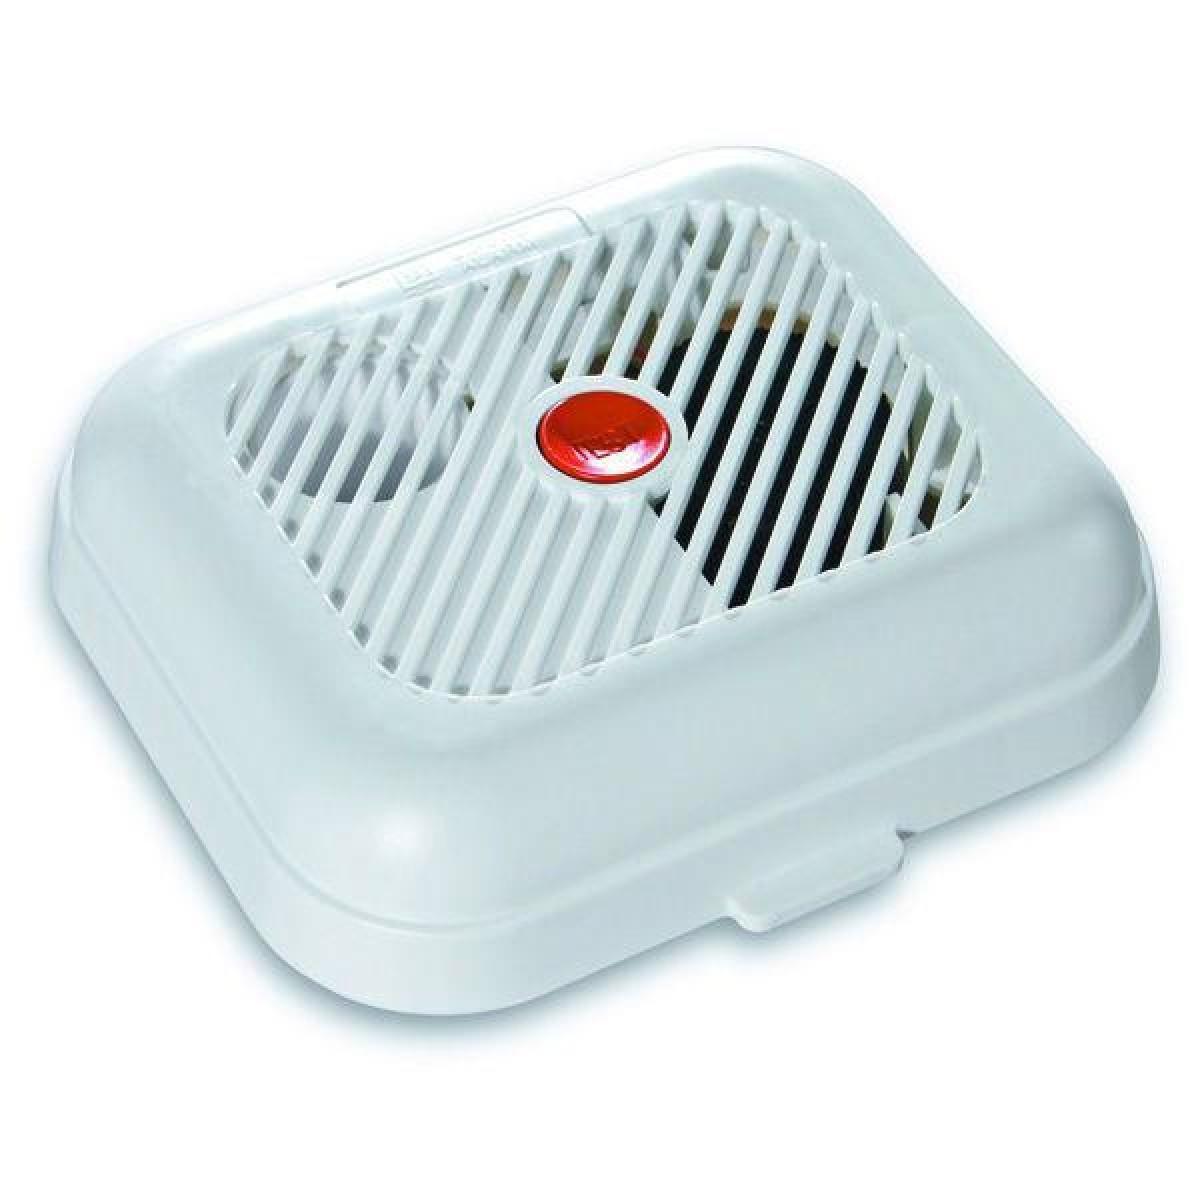 aico smoke alarm wiring diagram 1996 nissan sentra standard twin pack